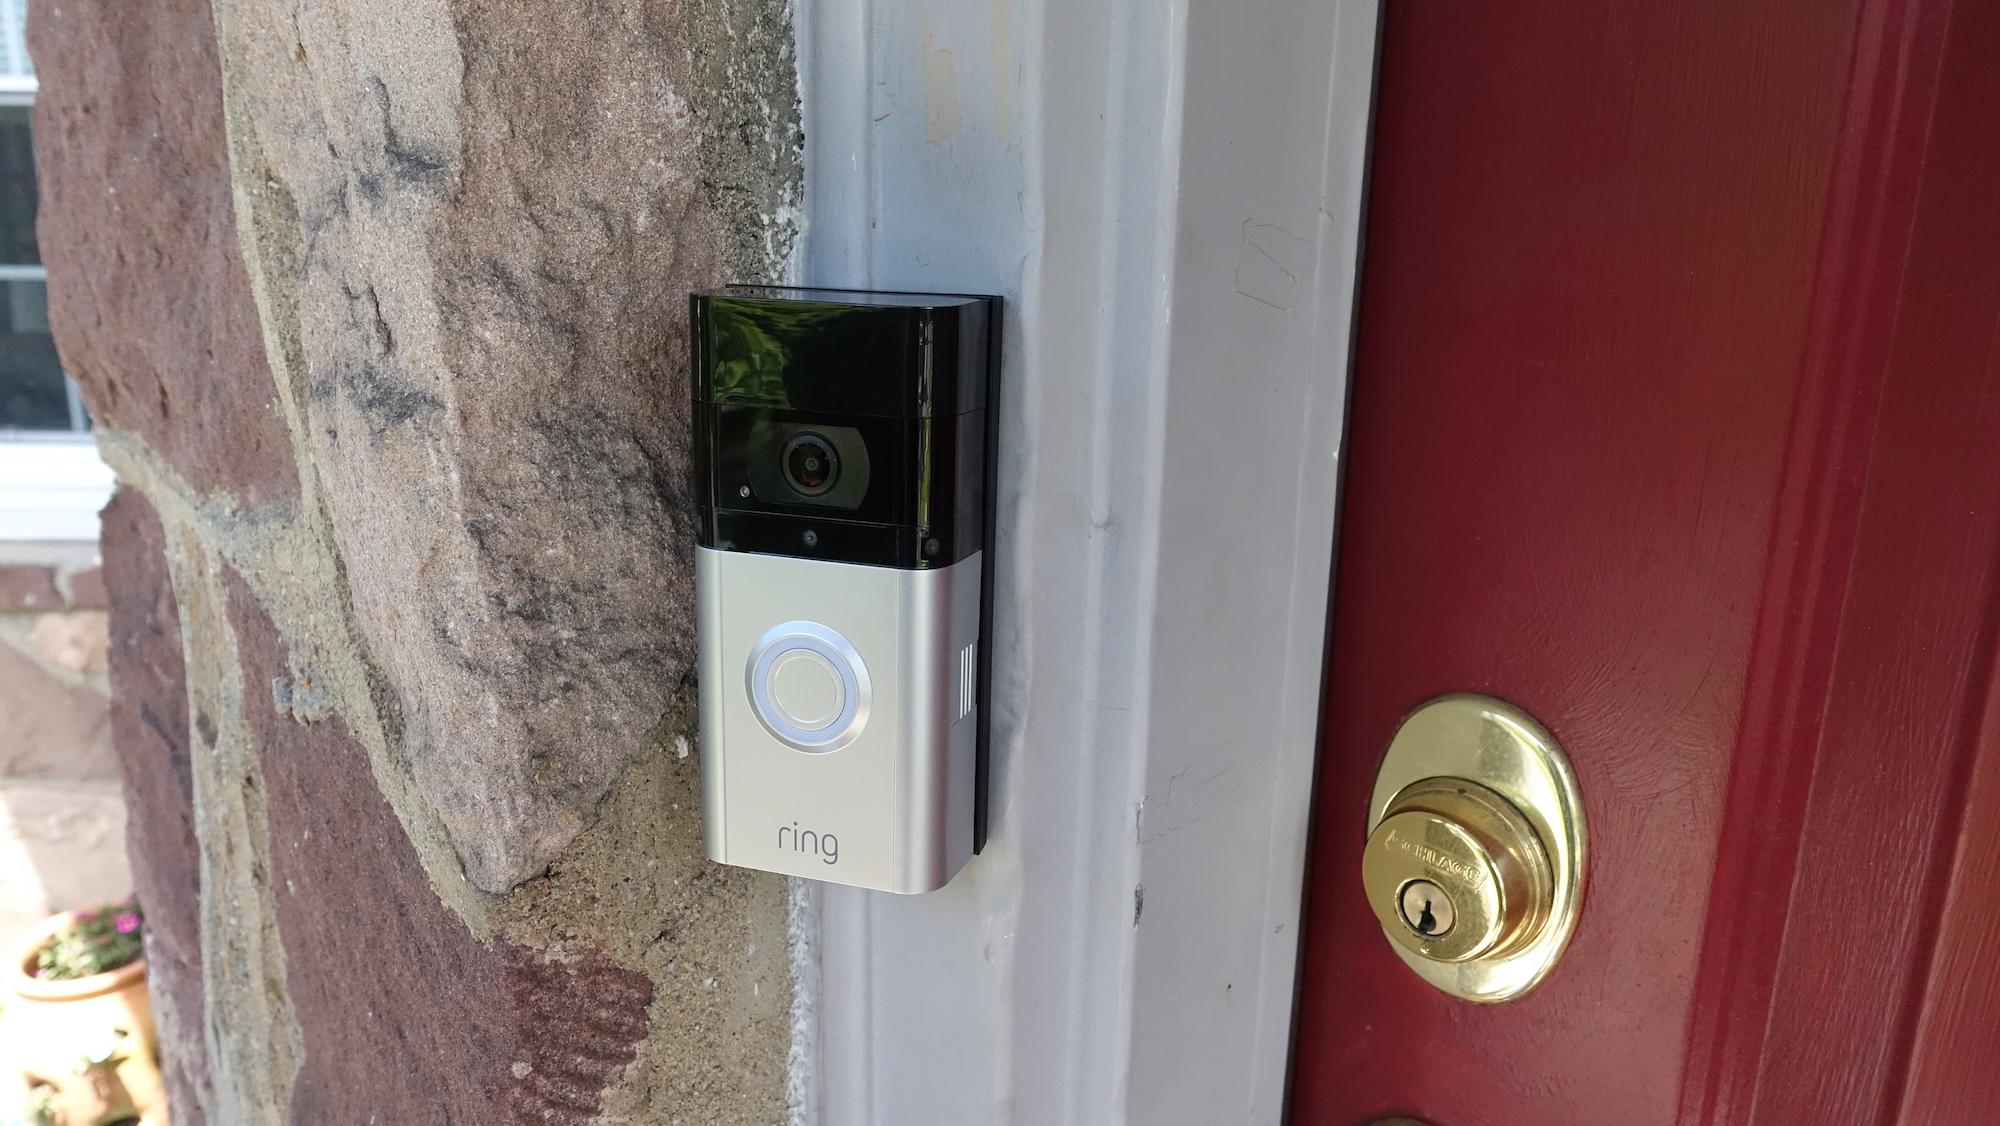 Ring video doorbell 3 plus rating